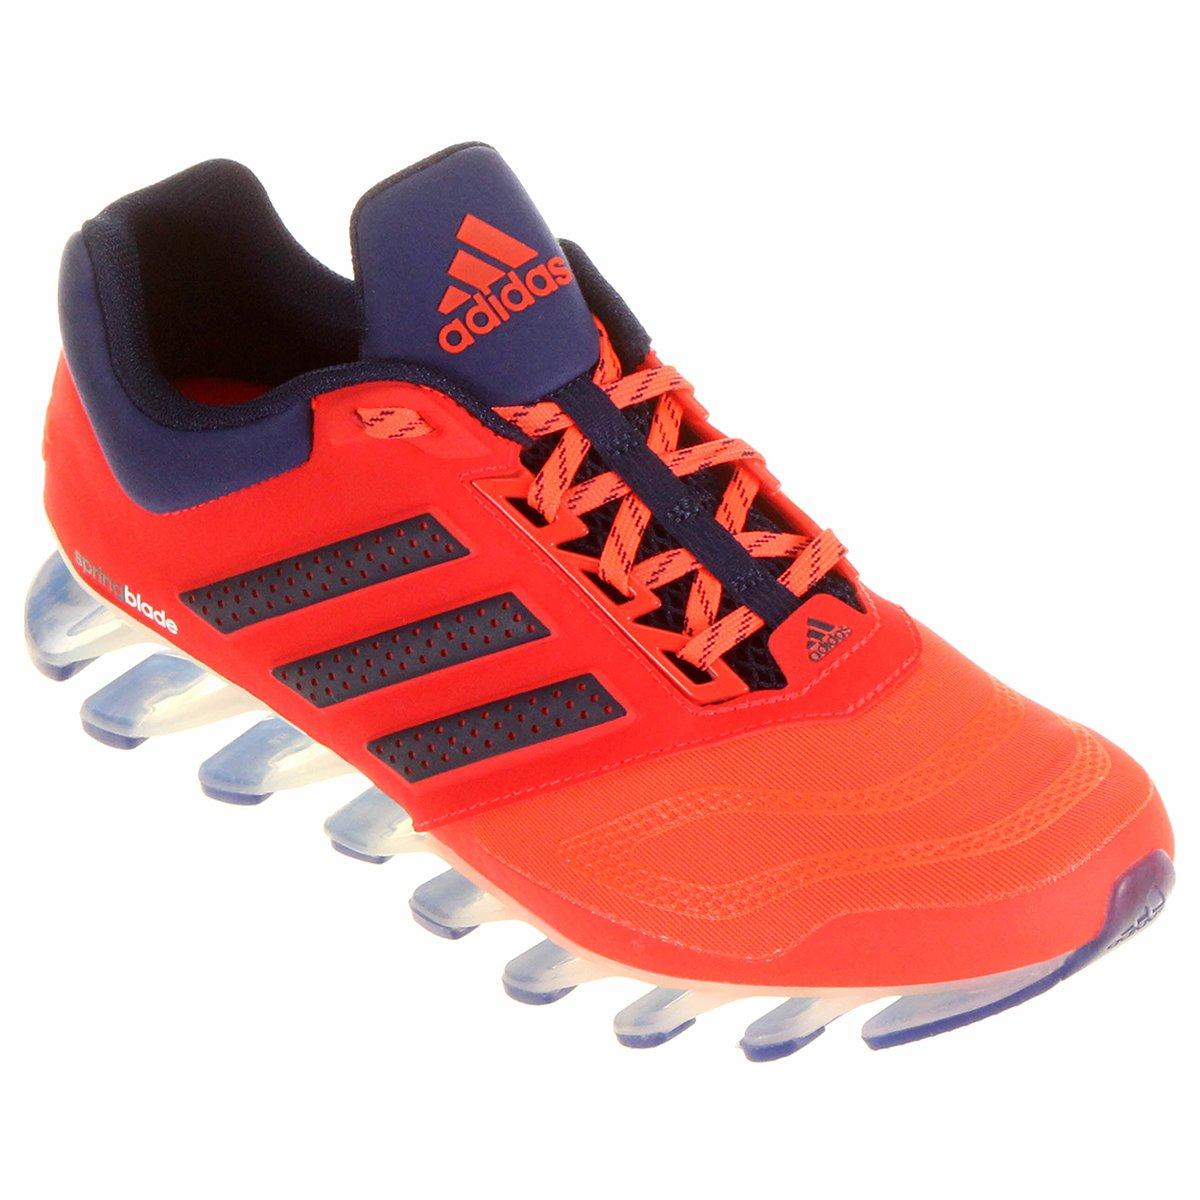 3277c8ade8b ... clearance tênis adidas springblade drive masculino laranjamarinho 99674  0abdb